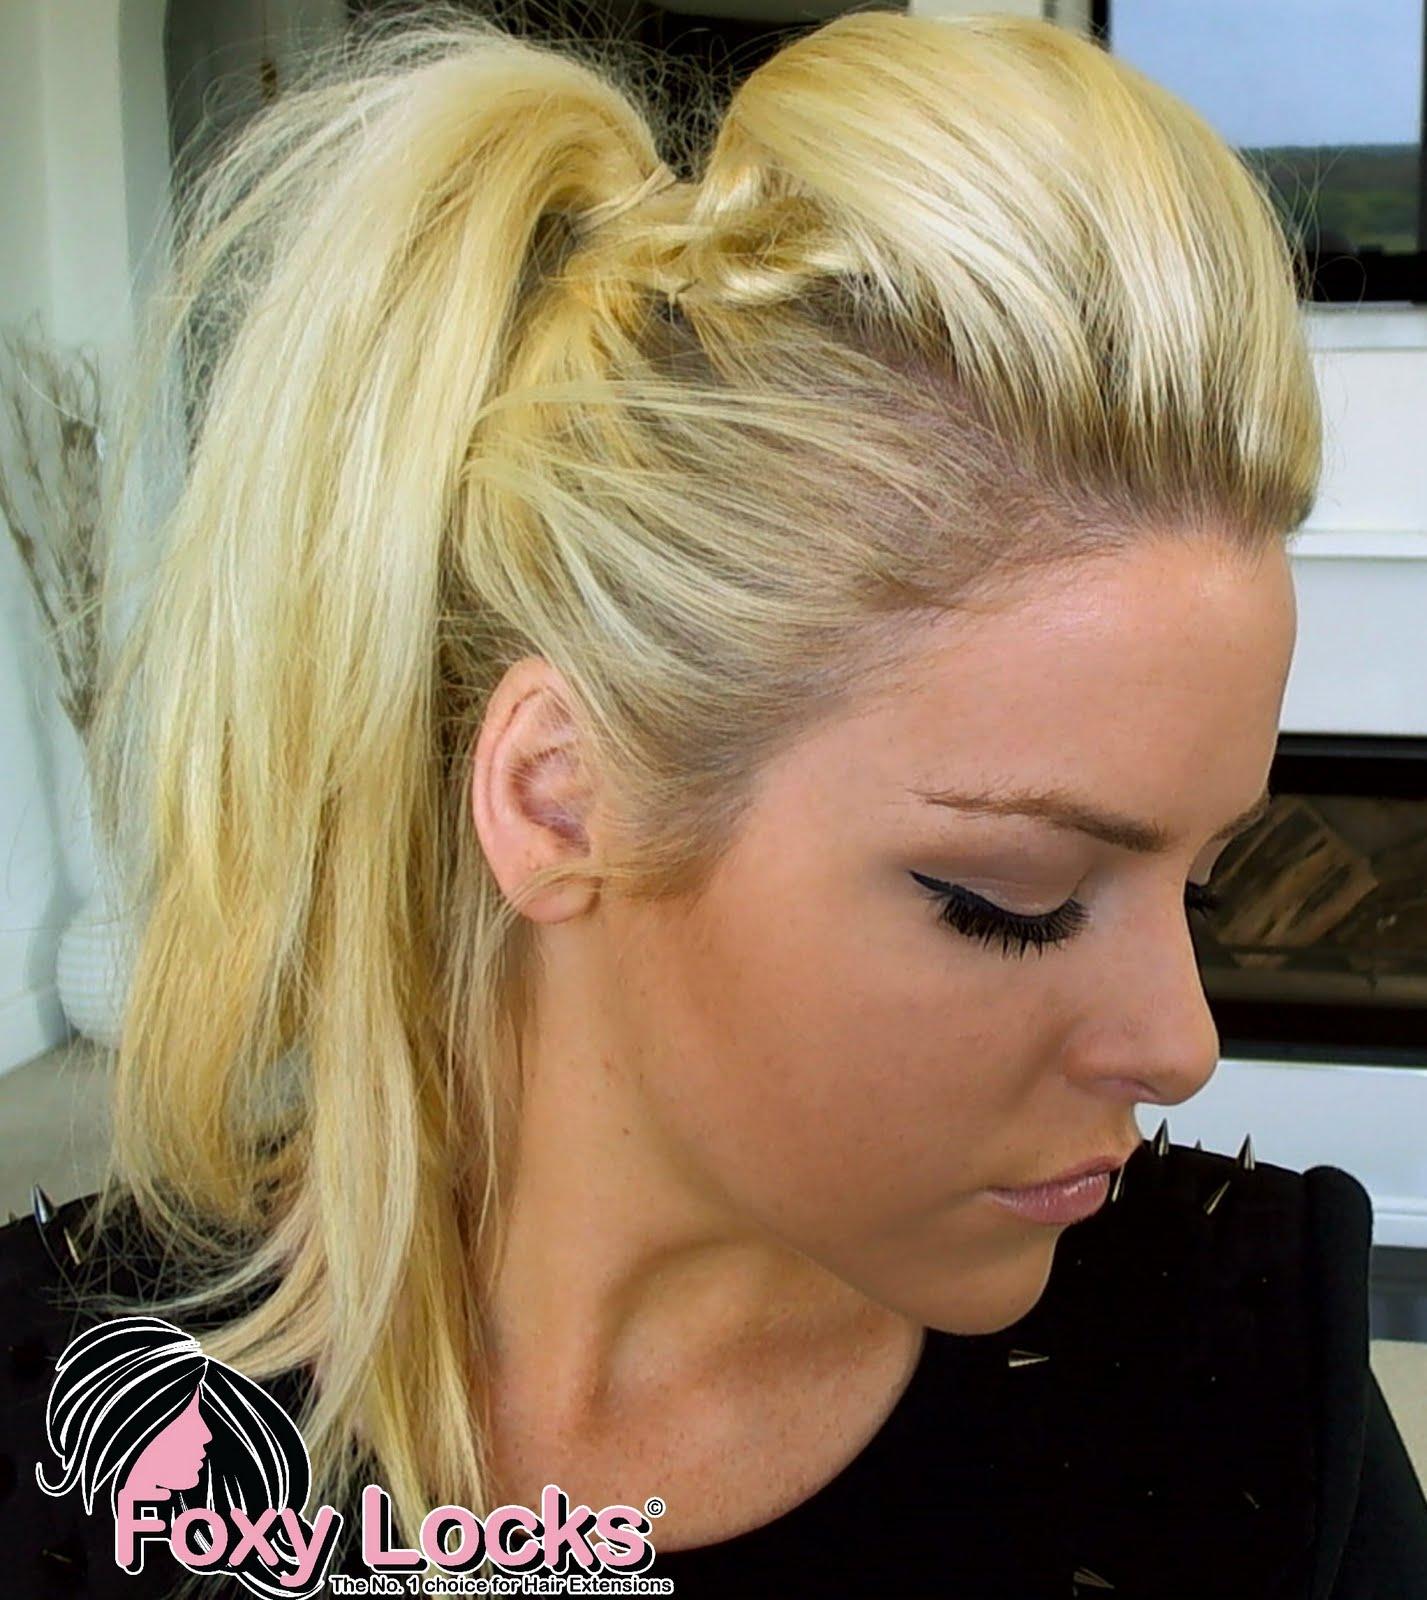 Imogen foxy locks july 2011 the queen of this hairstyle gwen stefani pmusecretfo Choice Image